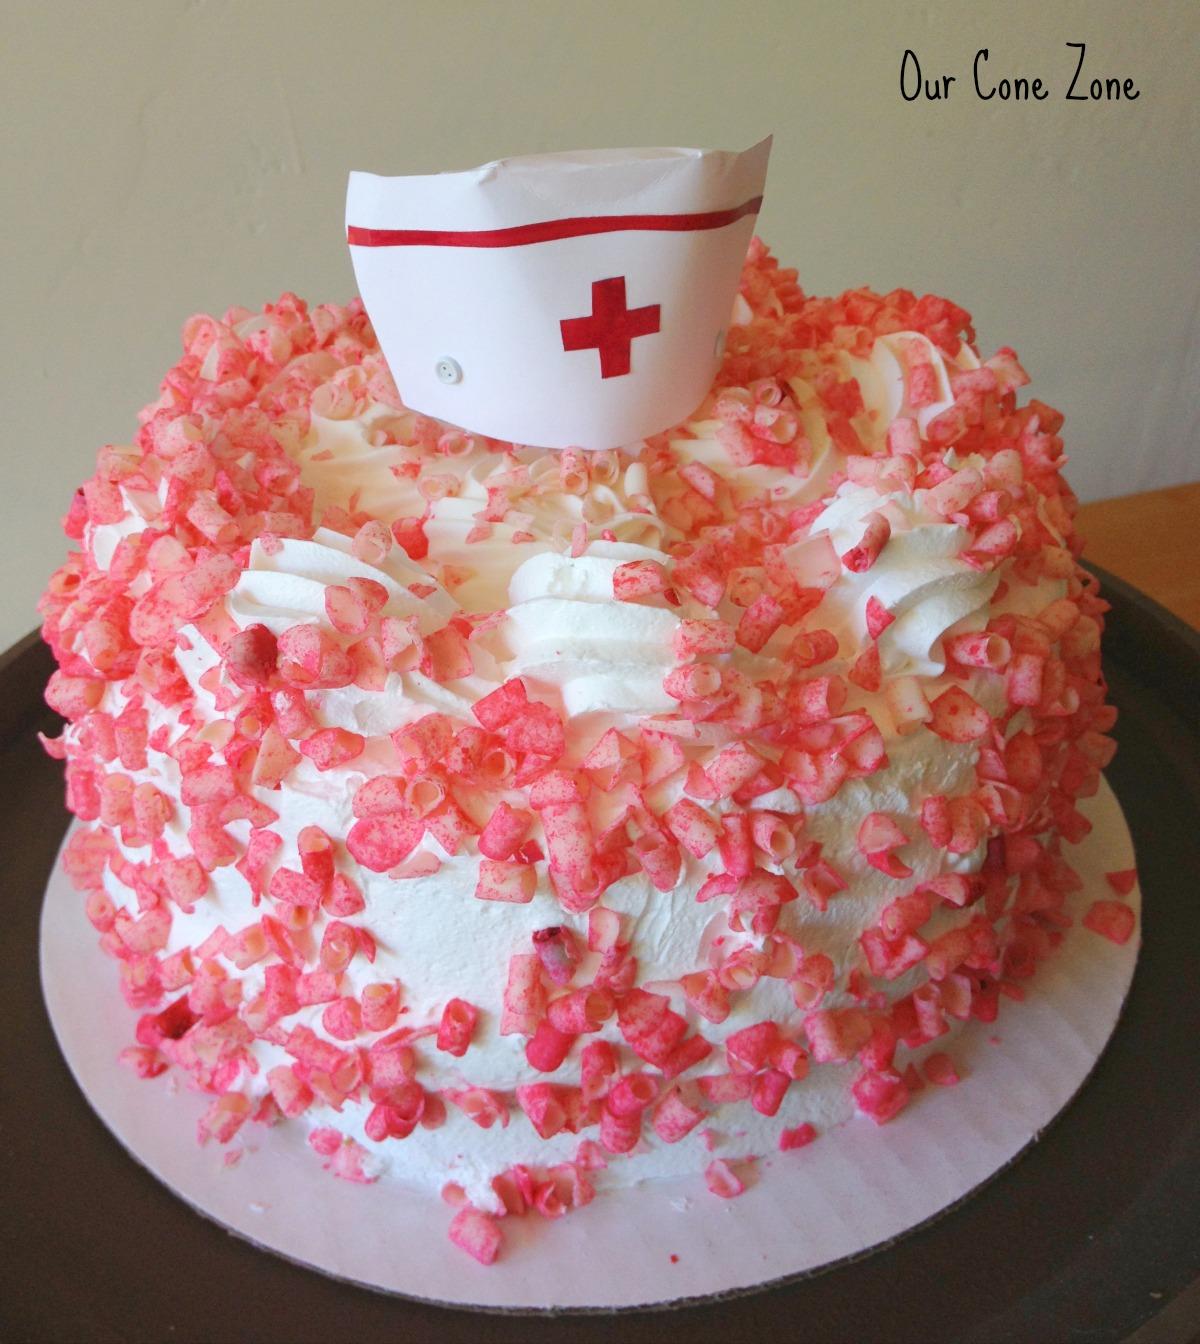 Nursing Student cake